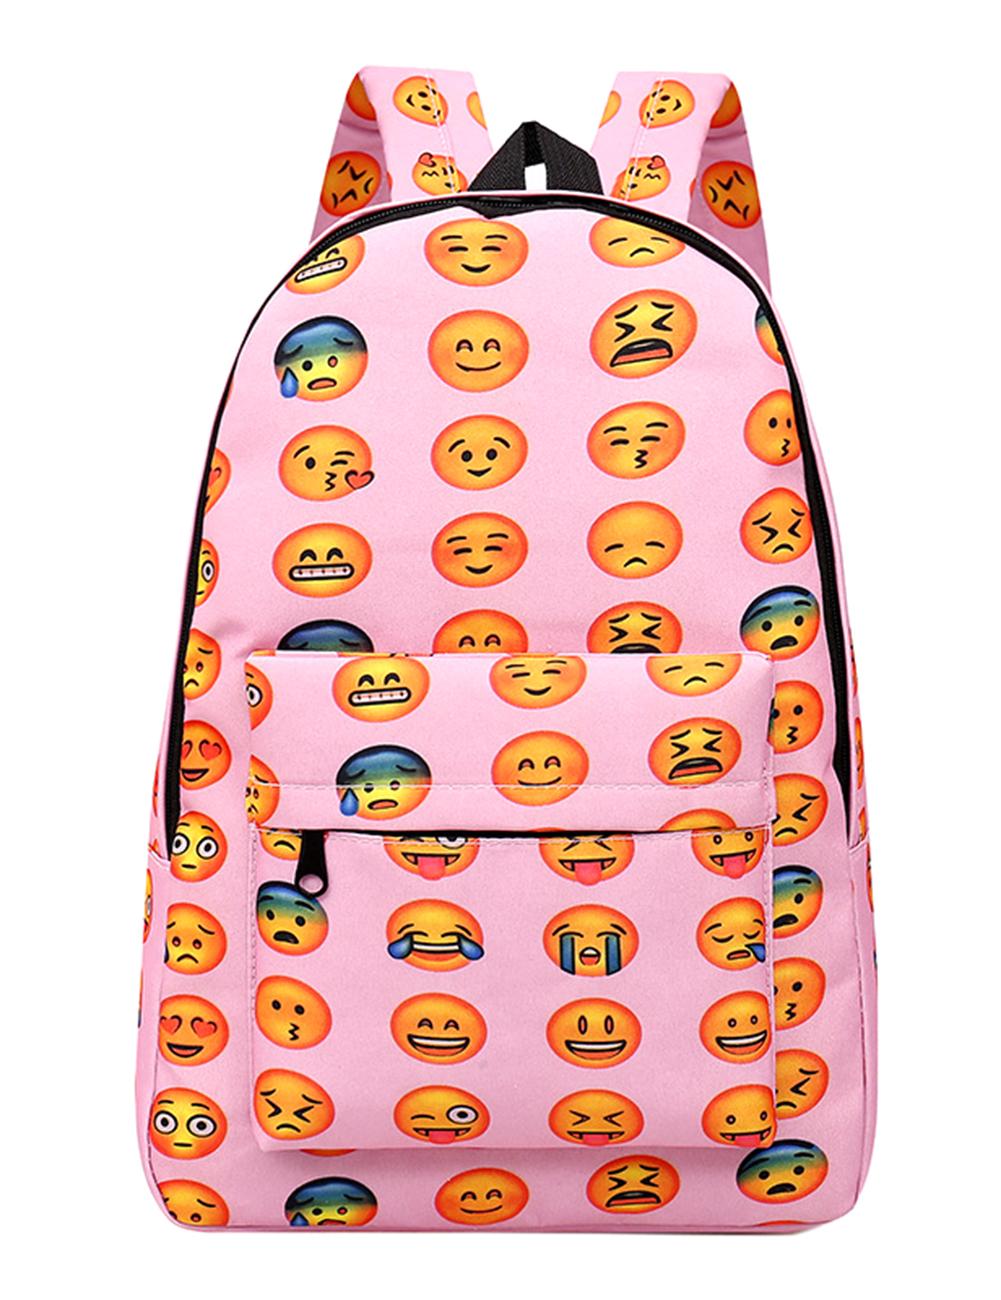 [EU Direct] Unisex Students' Big Capacity Backpack Oxford Cloth Cute Expression Shoulder Bag Pink